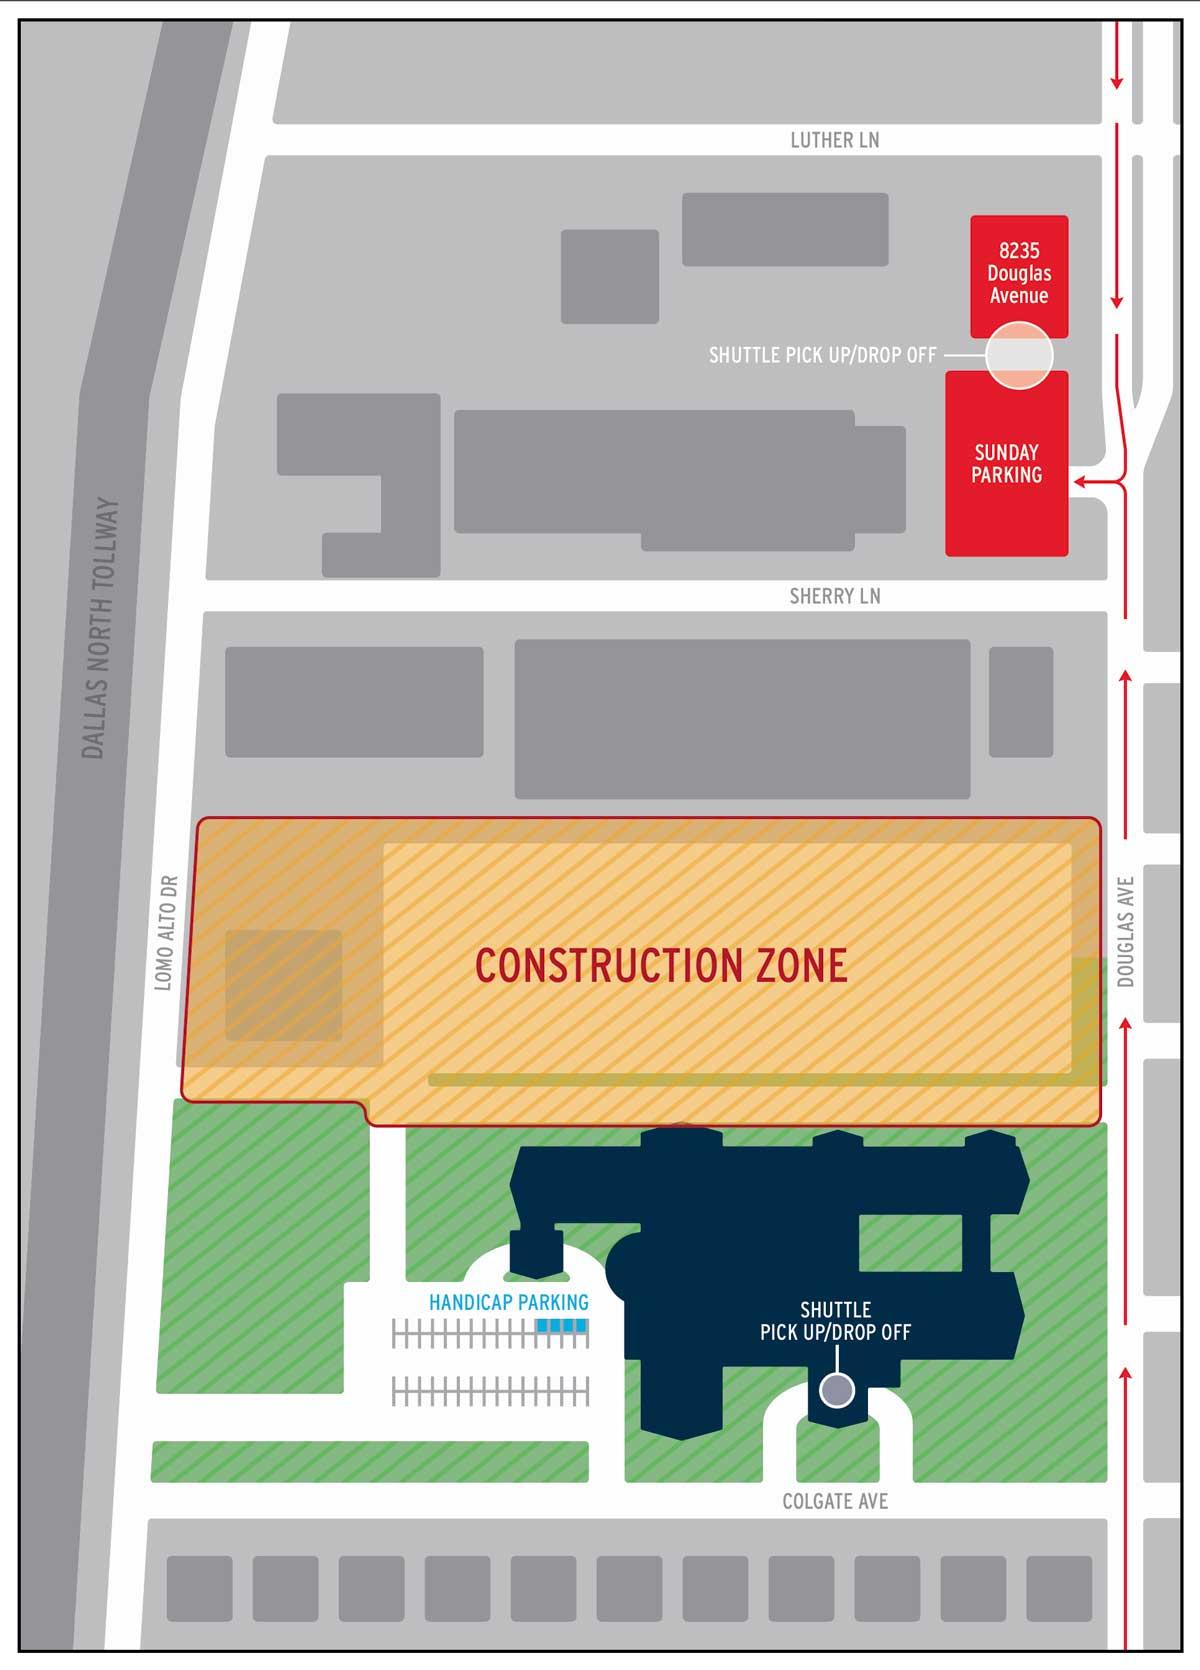 SMAA Offsite Parking for Sunday Morning beginning 8/15